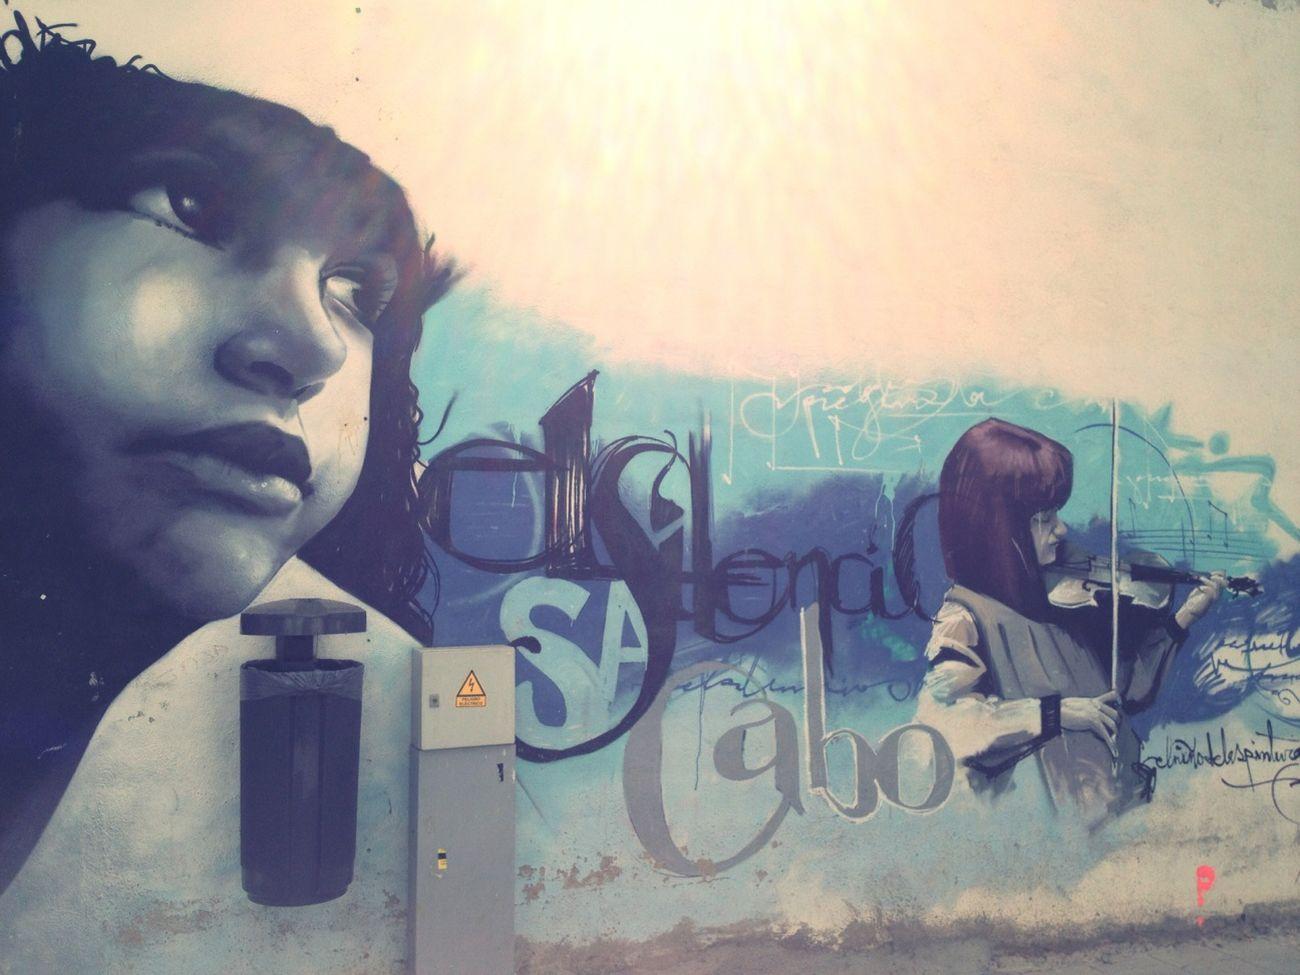 Streetphotography Graffiti Streetart Art